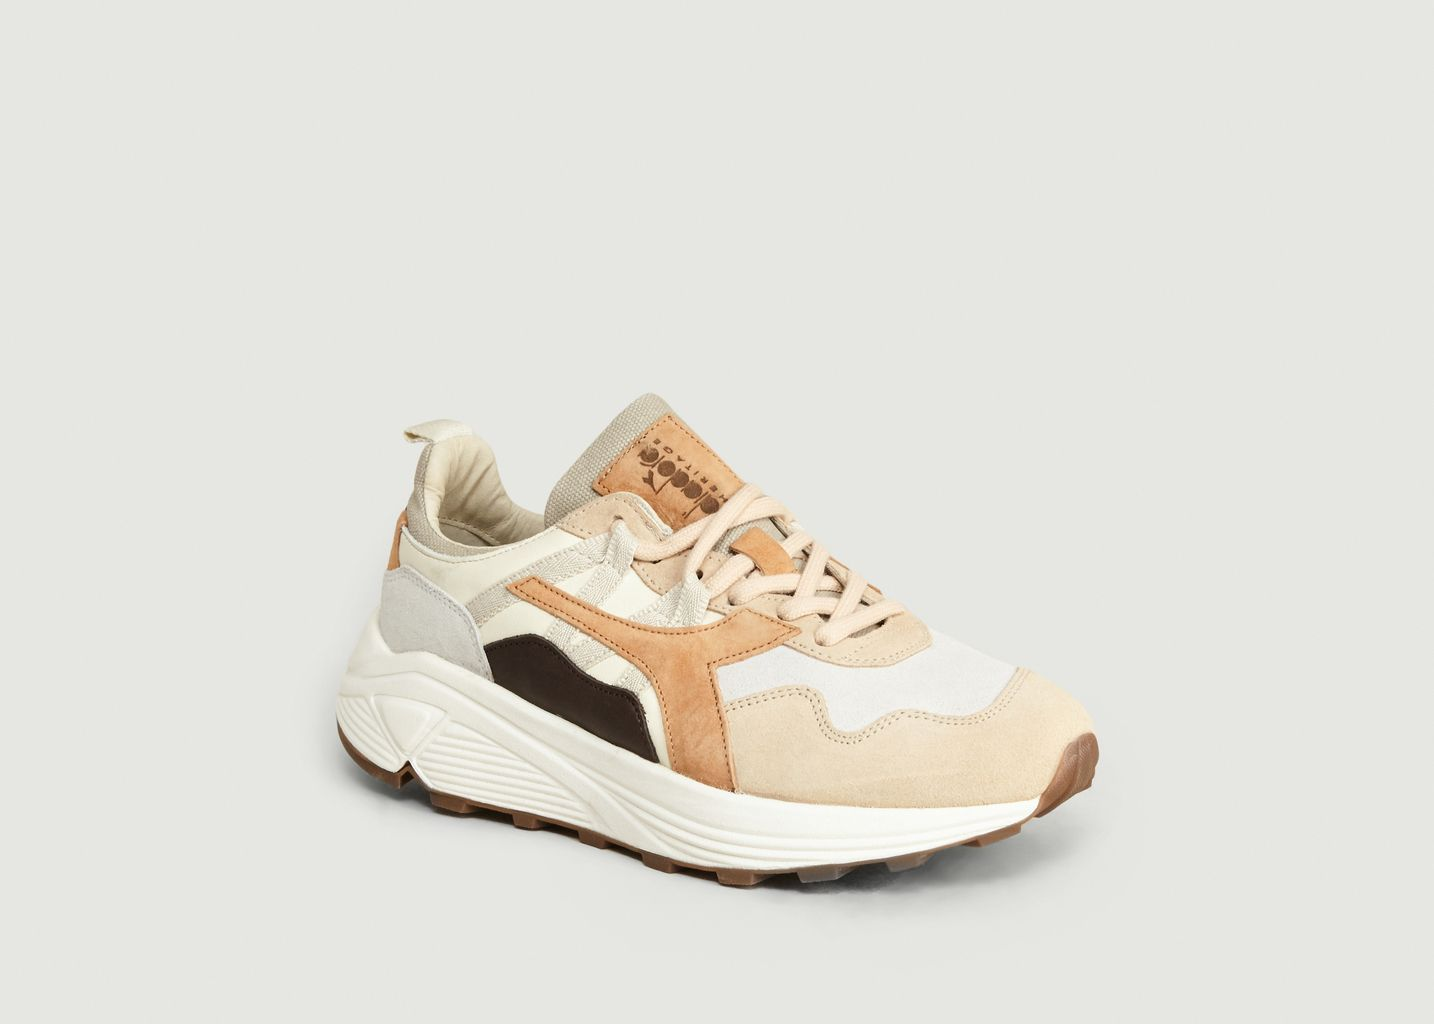 Concepts X Diadora Lira | Shoes, Sneakers, Best sneakers